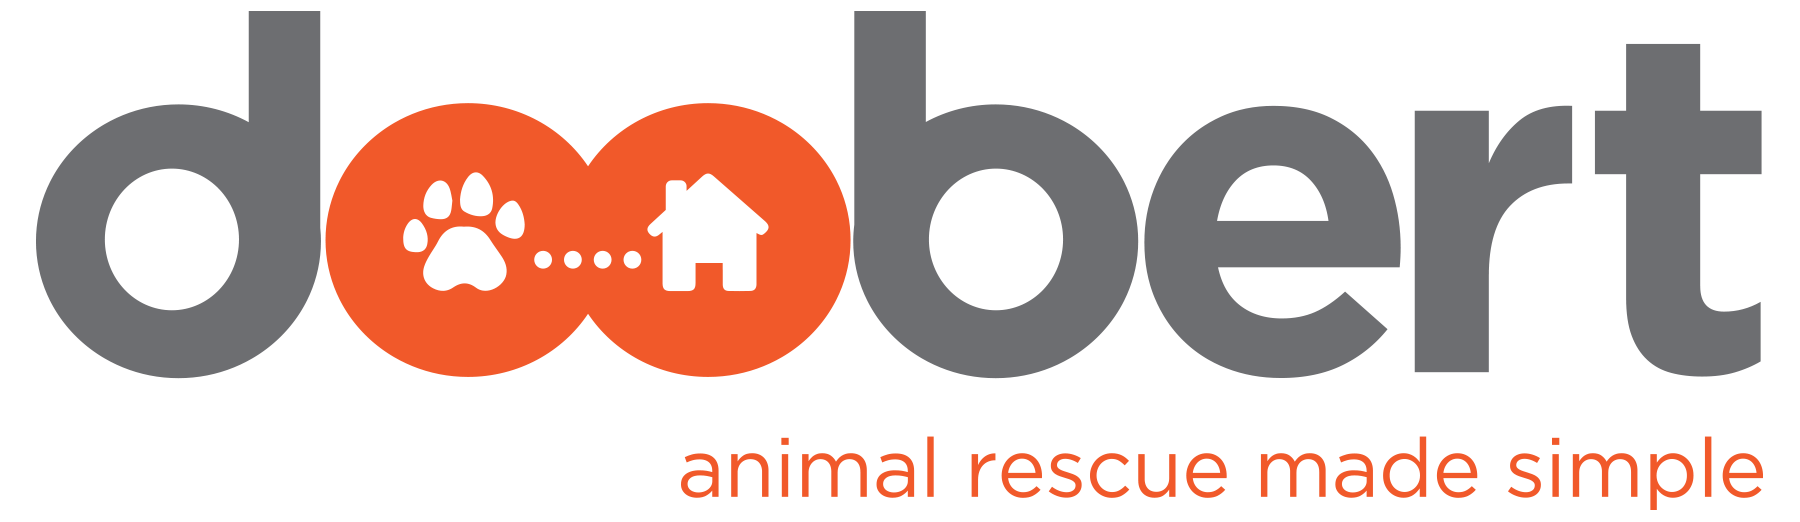 Doobert Logo